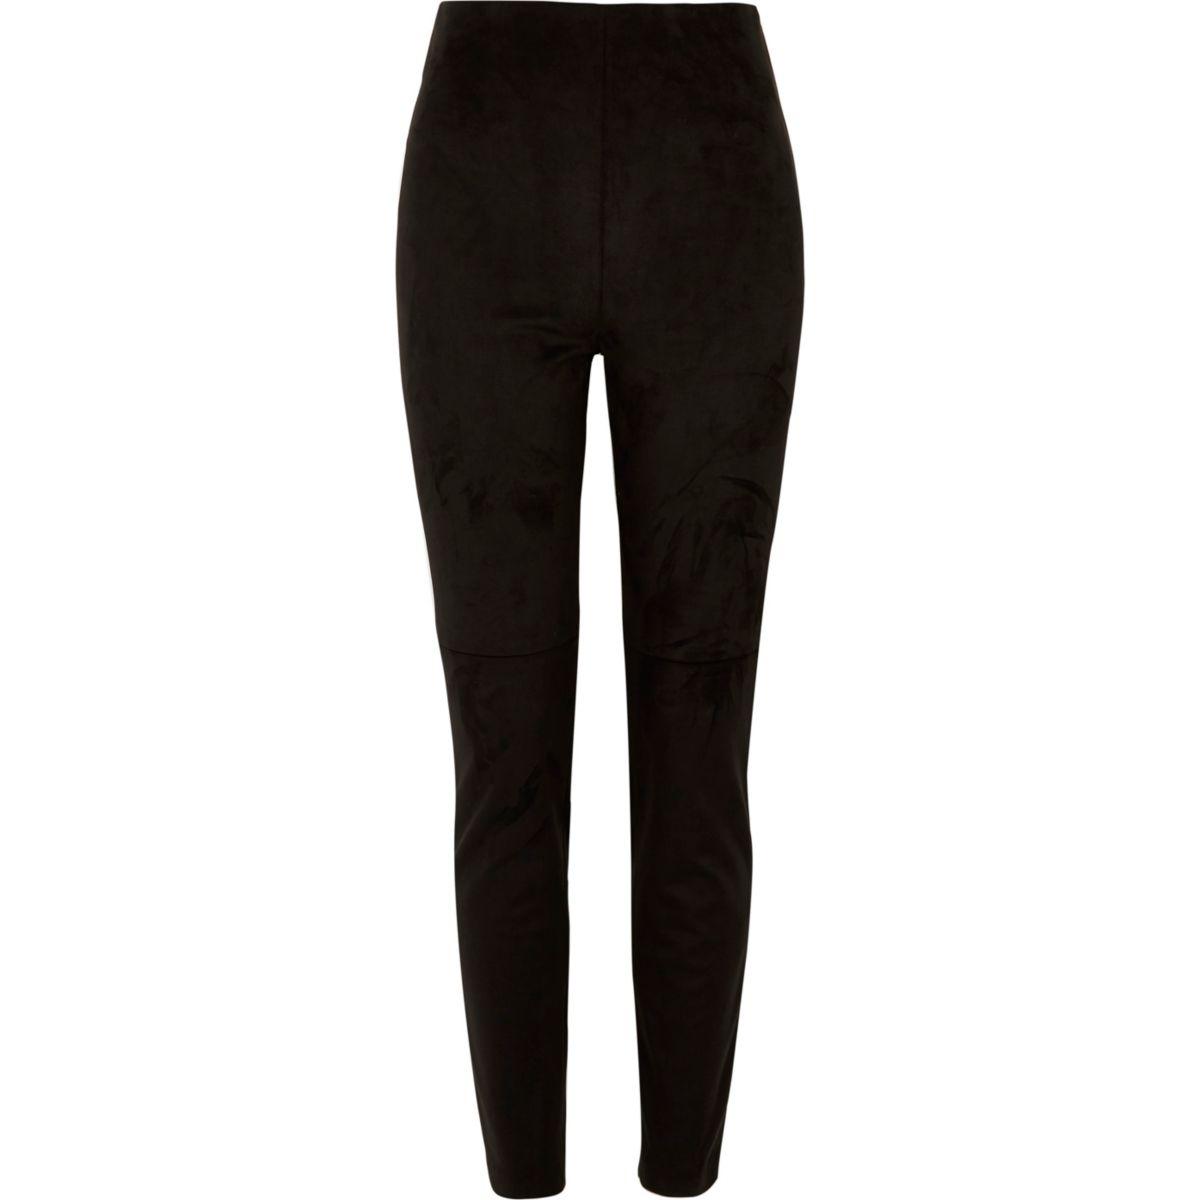 Black moleskin skinny pants